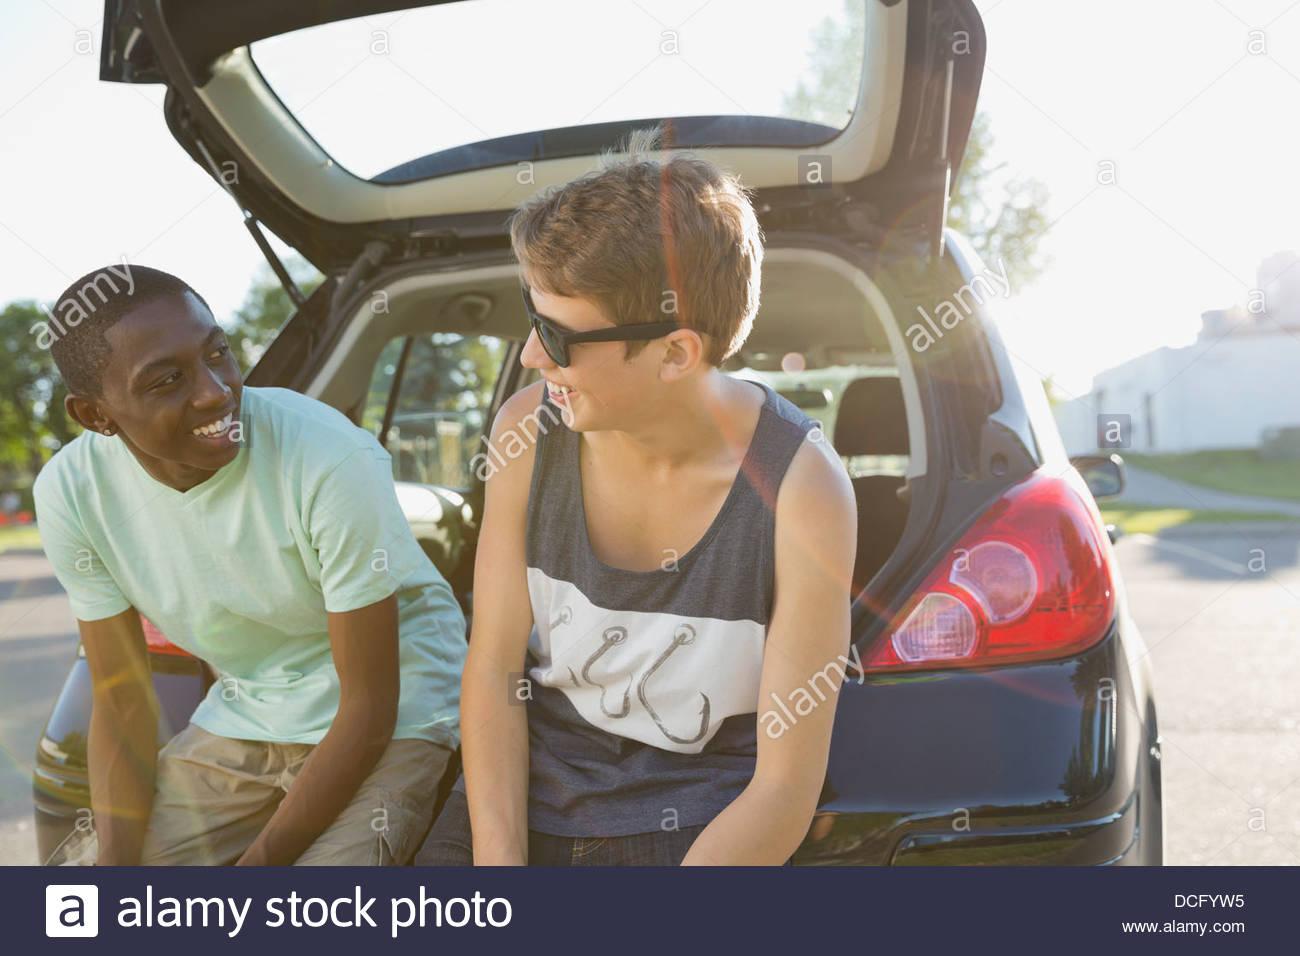 Teens sitting on car bumper - Stock Image